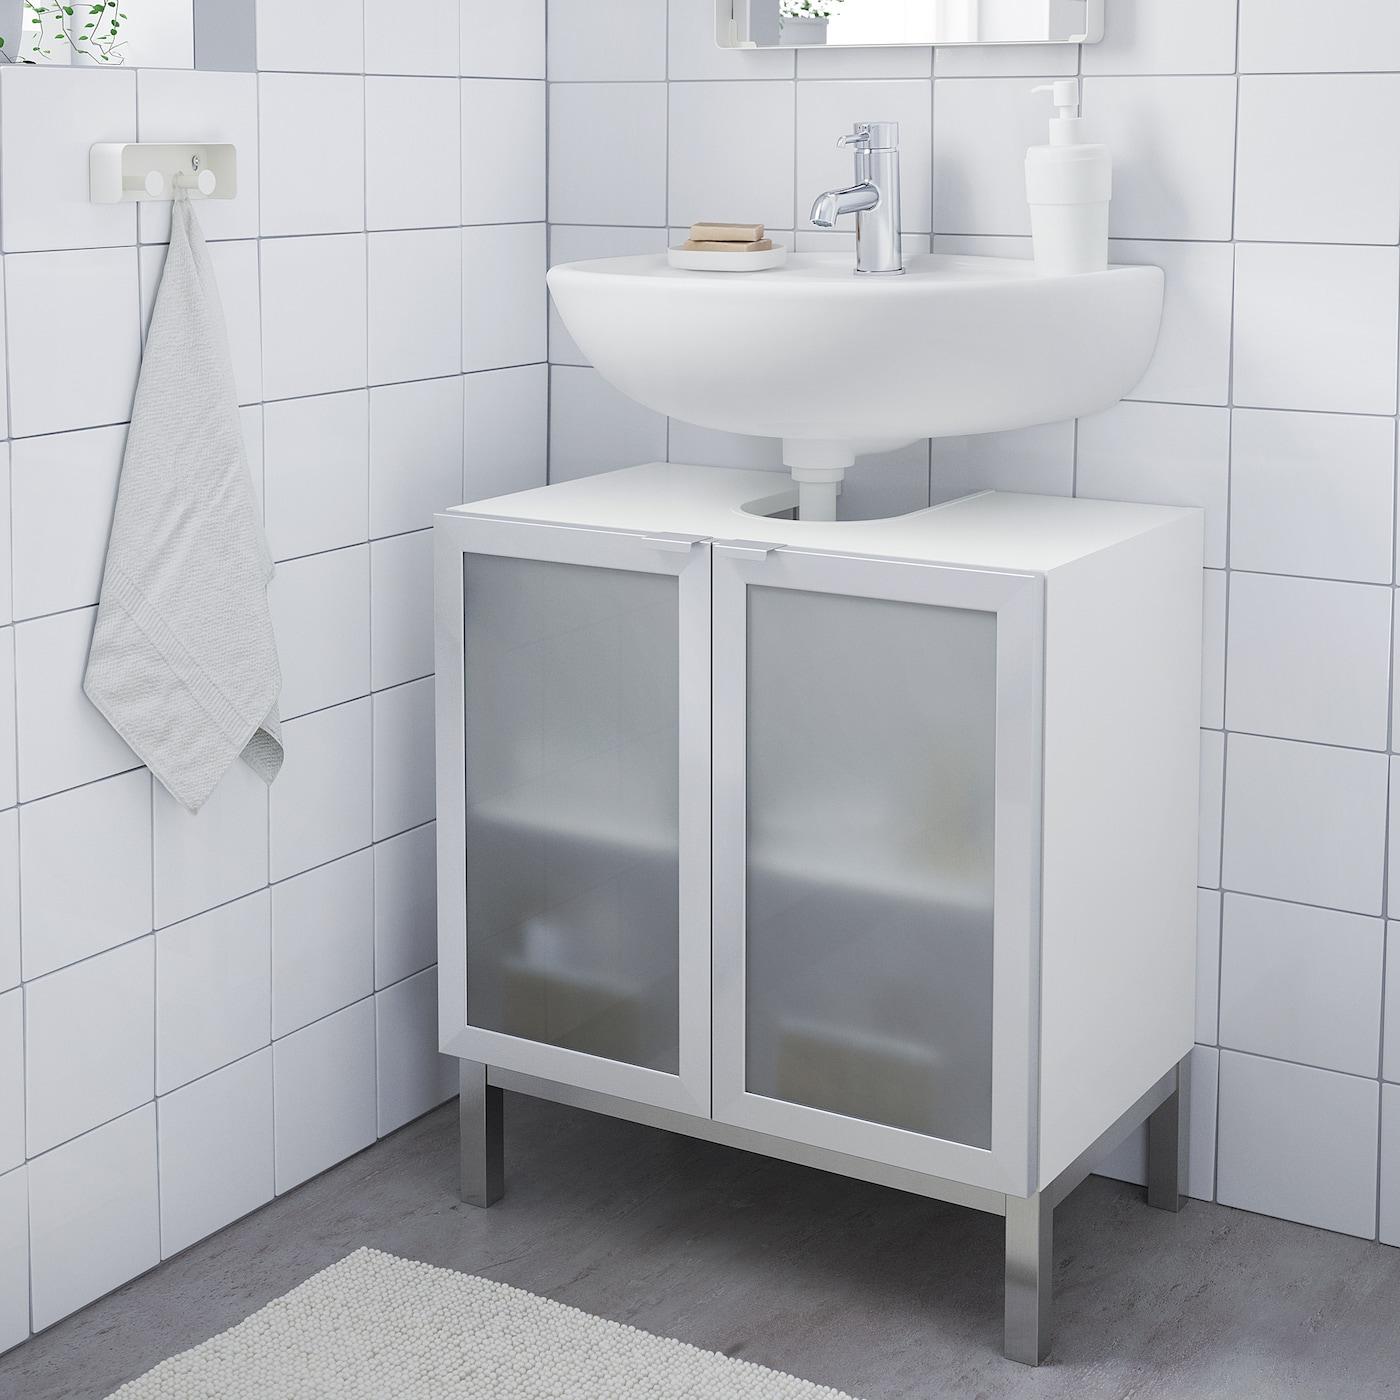 Lillangen Waschbeckenunterschrank 2 Turen Weiss Aluminium Ikea Deutschland